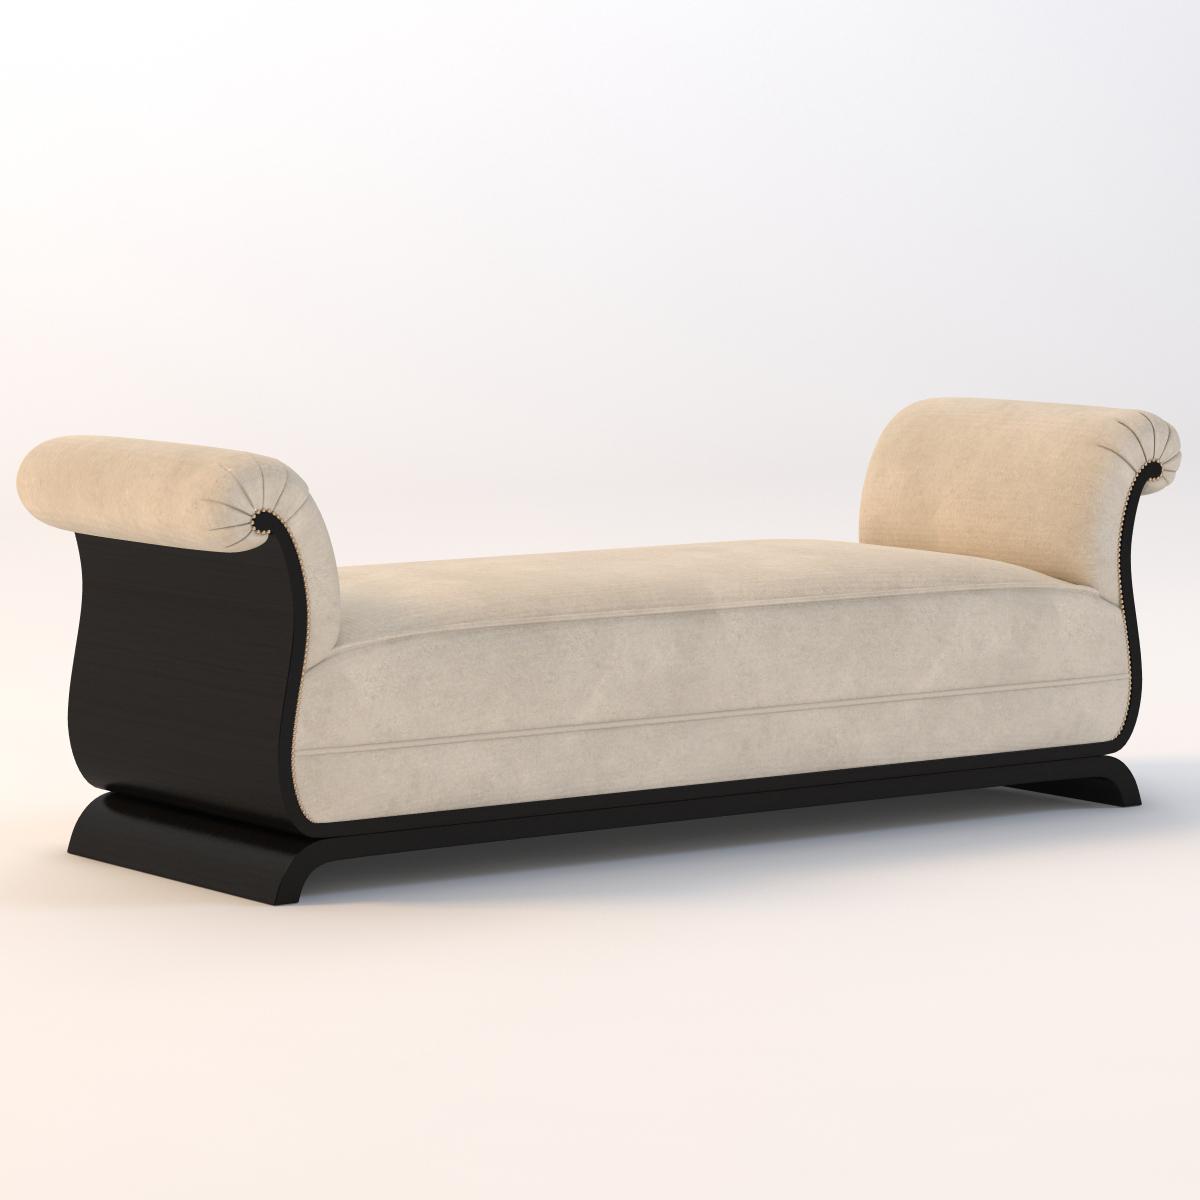 Swell Art Deco Sofa Daybed Evergreenethics Interior Chair Design Evergreenethicsorg